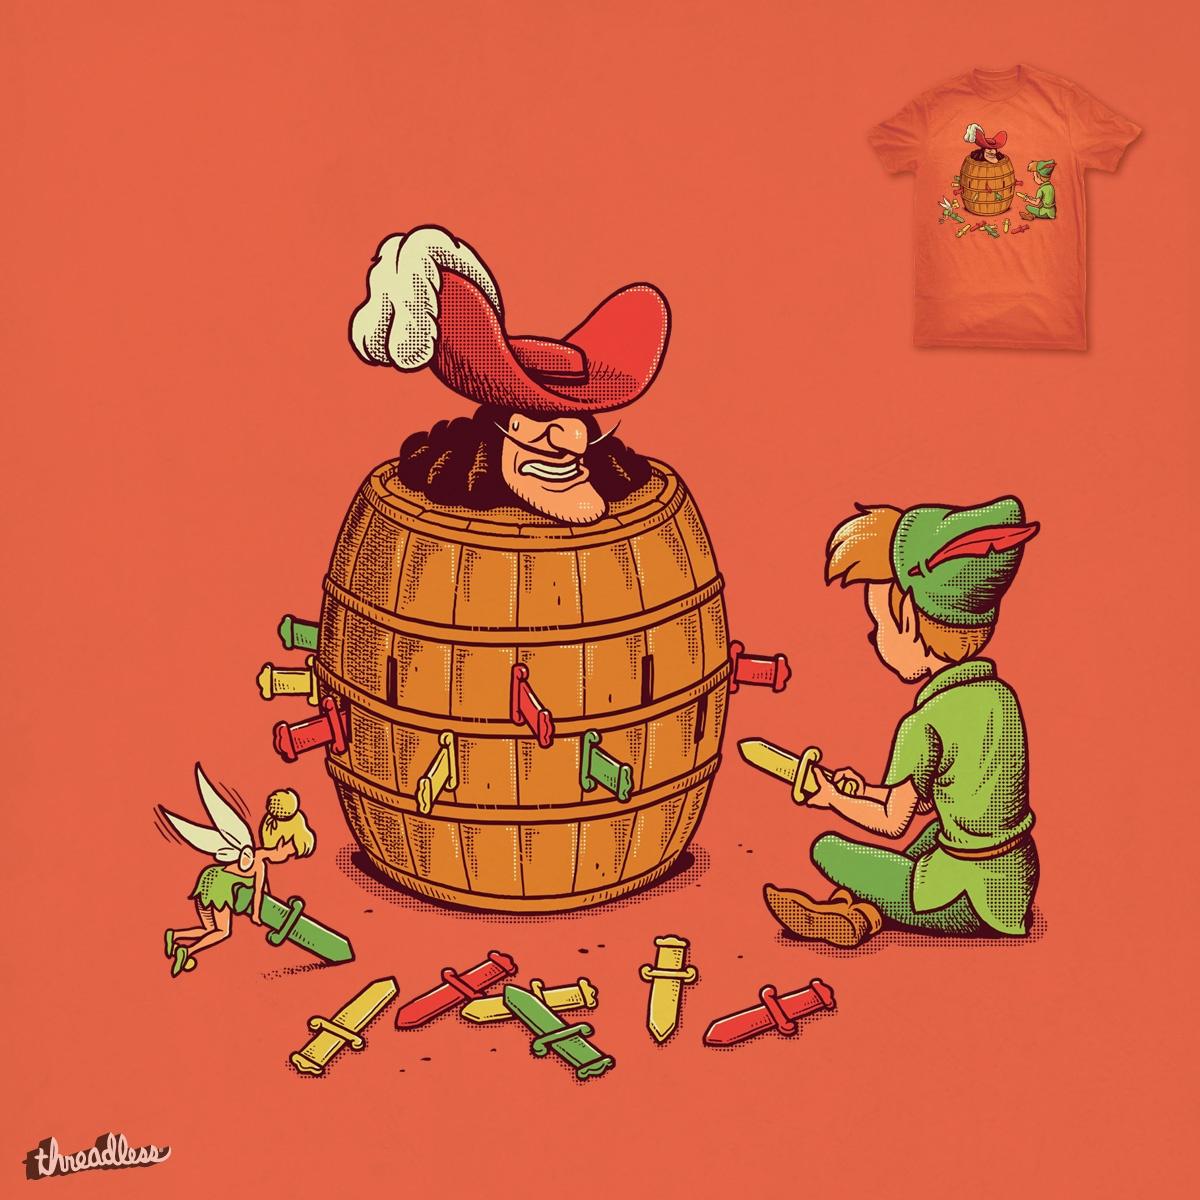 Pirate Barrel Game by ben chen on Threadless